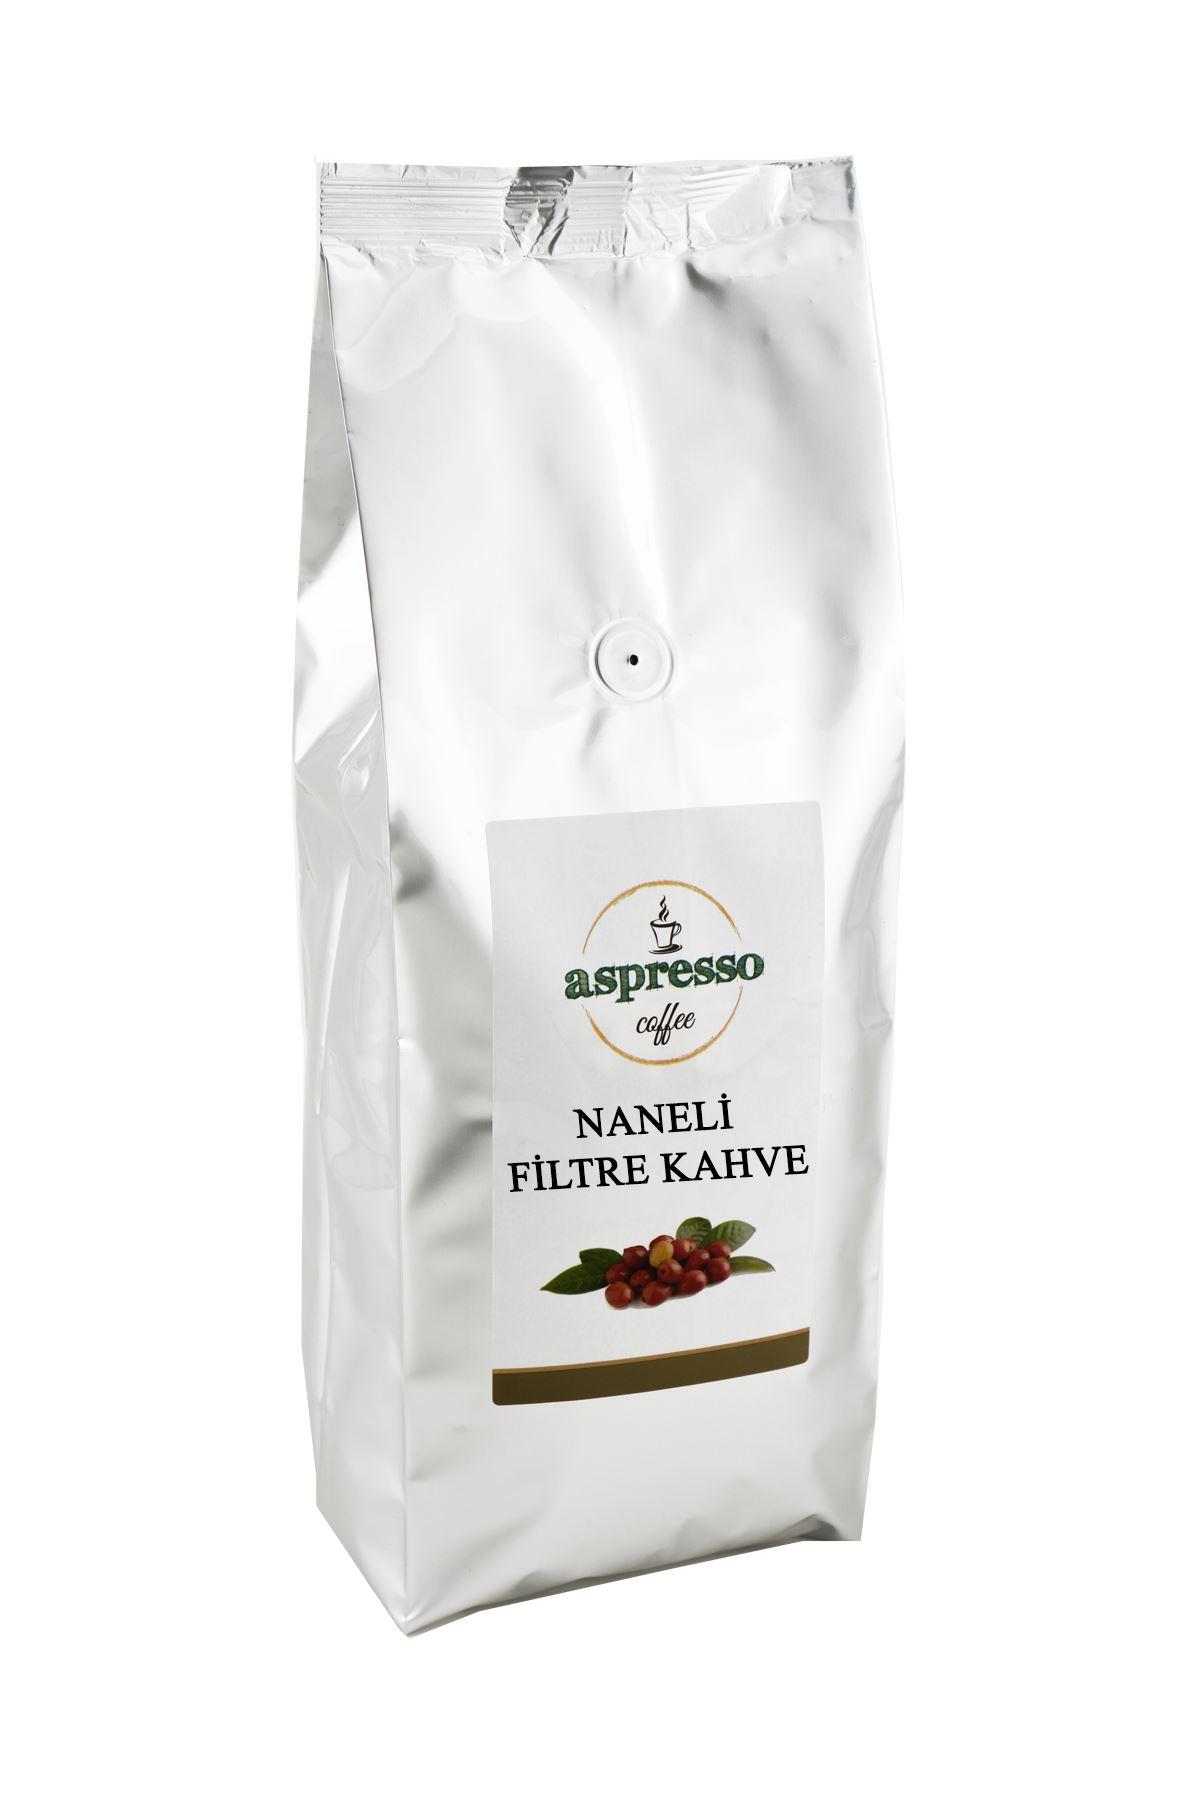 Naneli Filtre Kahve 250 gr.